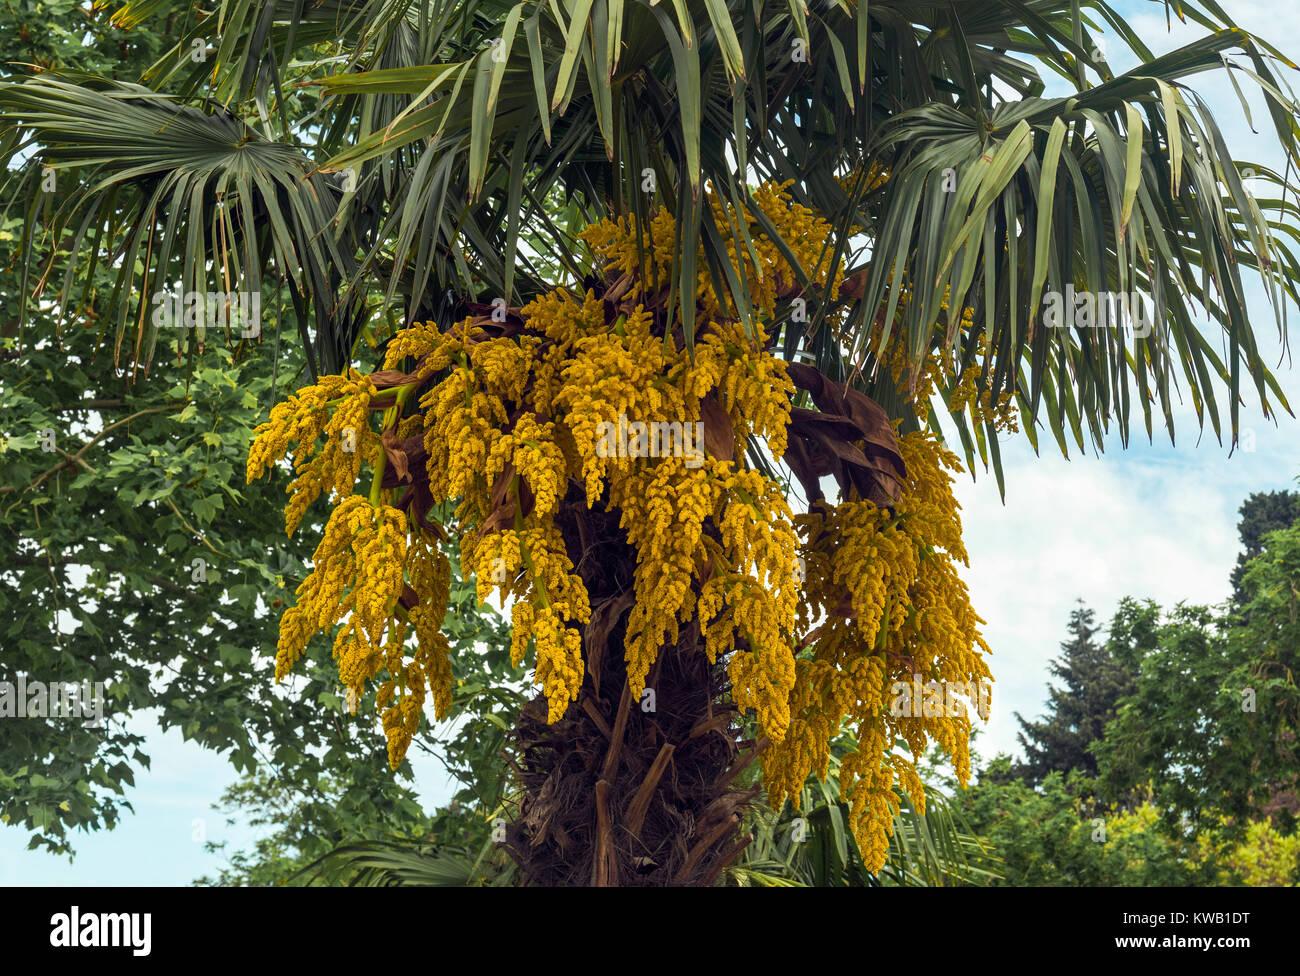 Blossoming palm tree yellow flowers stock photos blossoming palm blooming palm tree stock image mightylinksfo